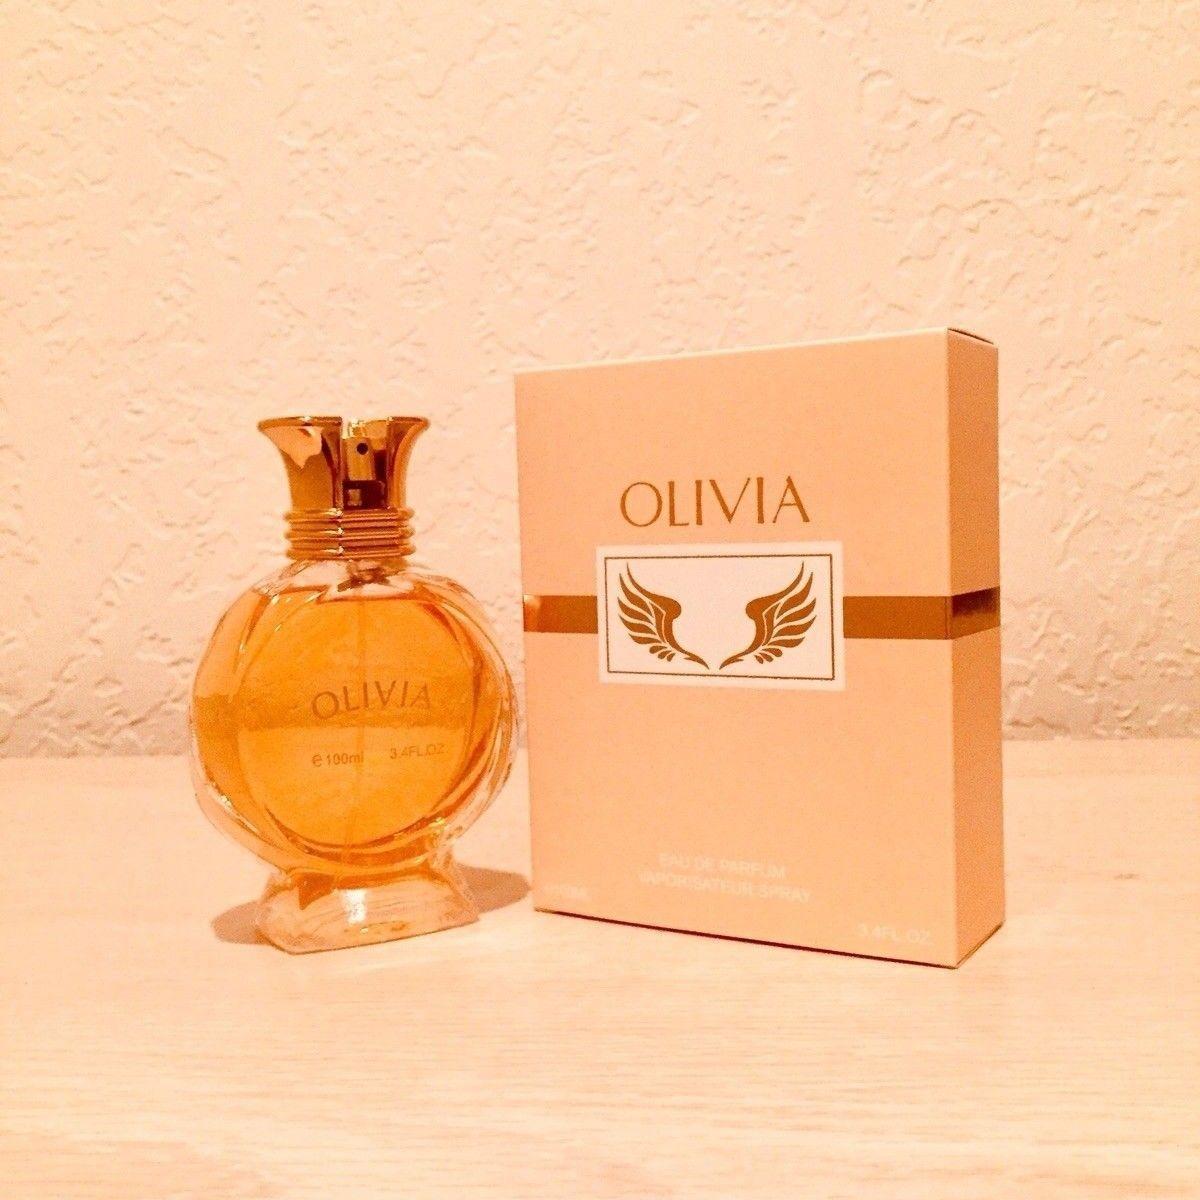 Olivia Womens Perfume Eau De Perfume 3 4 Fl Oz 100 Mle Vaporisateur Brand New Perfume Women Perfume Eau De Parfum